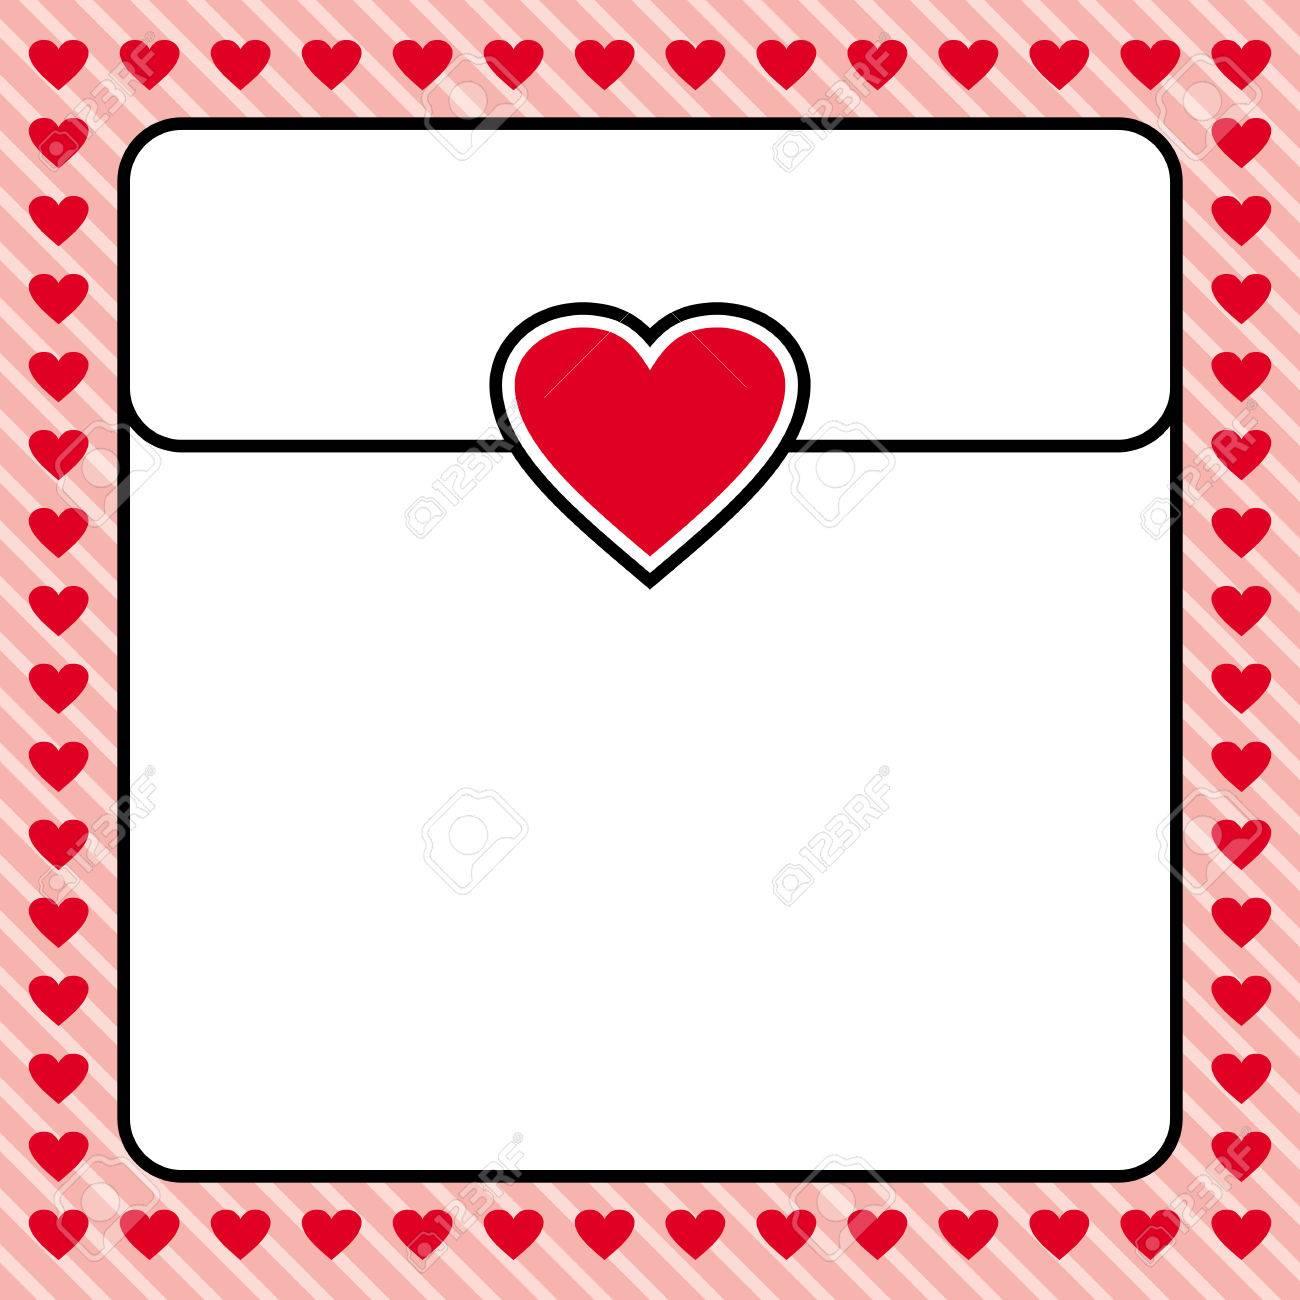 red heart border frame vector design for valentines day love letter love card